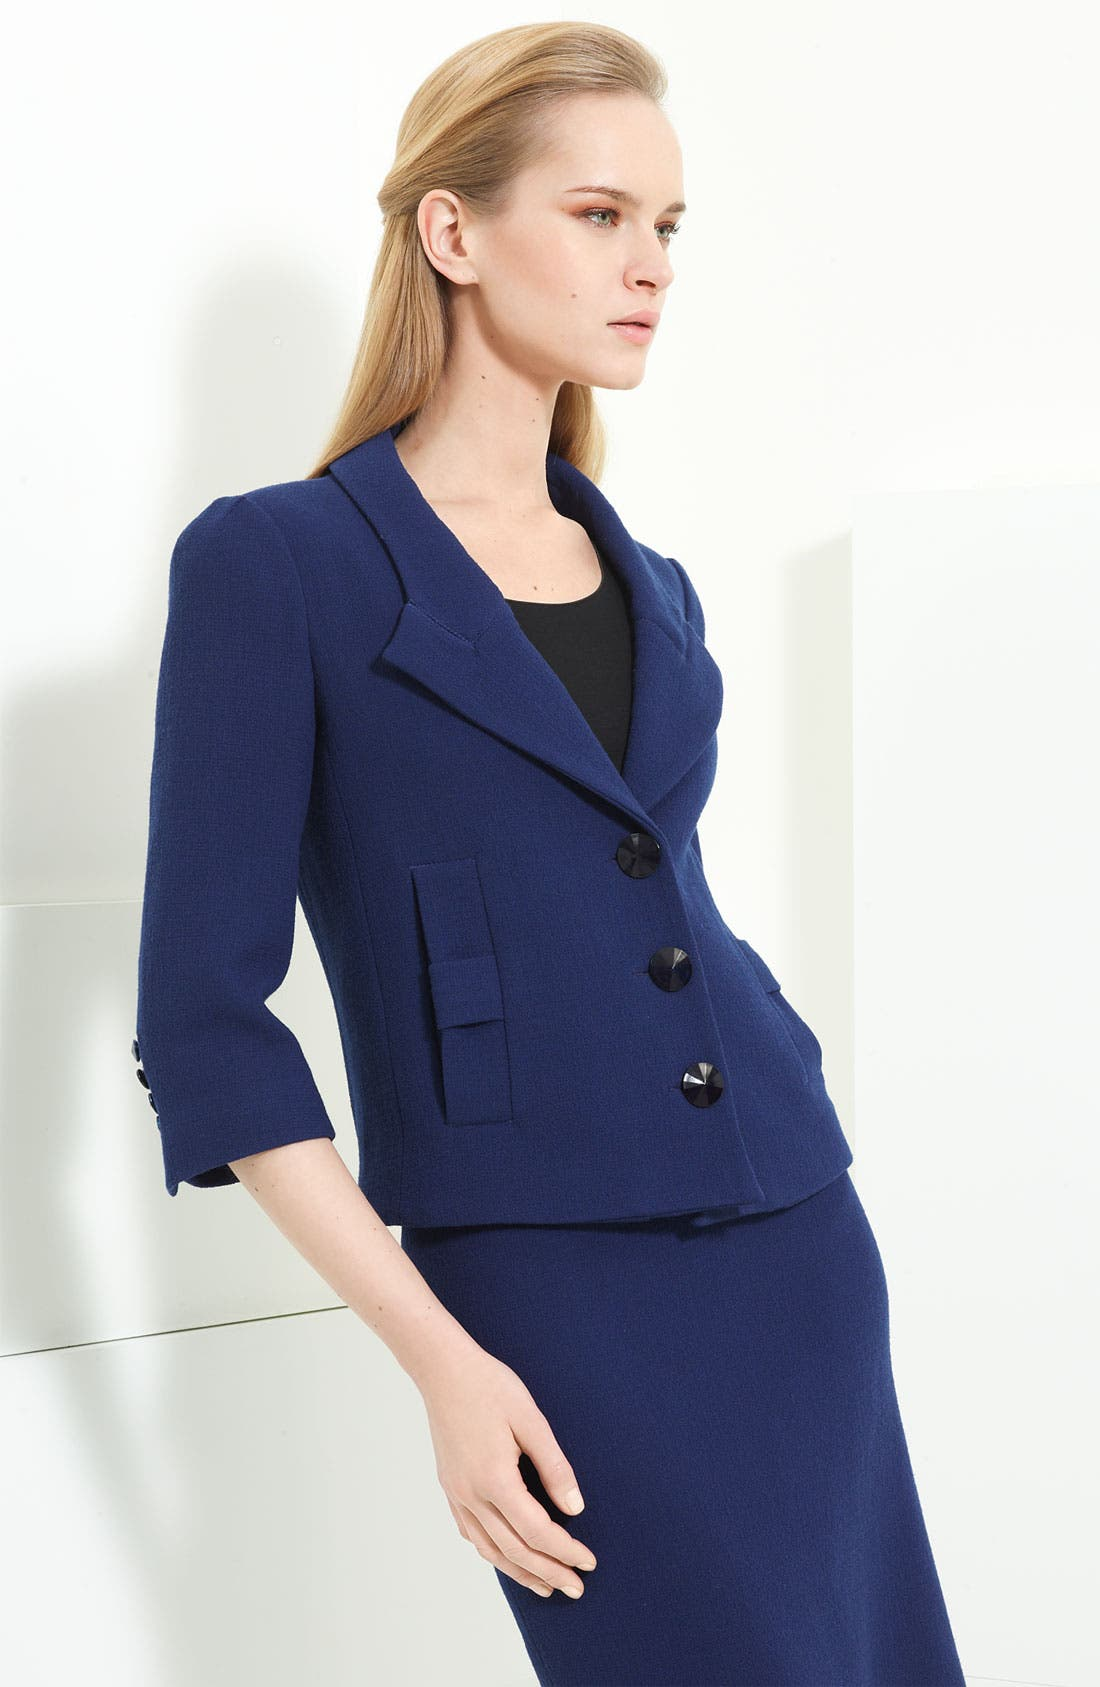 Alternate Image 1 Selected - Armani Collezioni Crepe Jacket